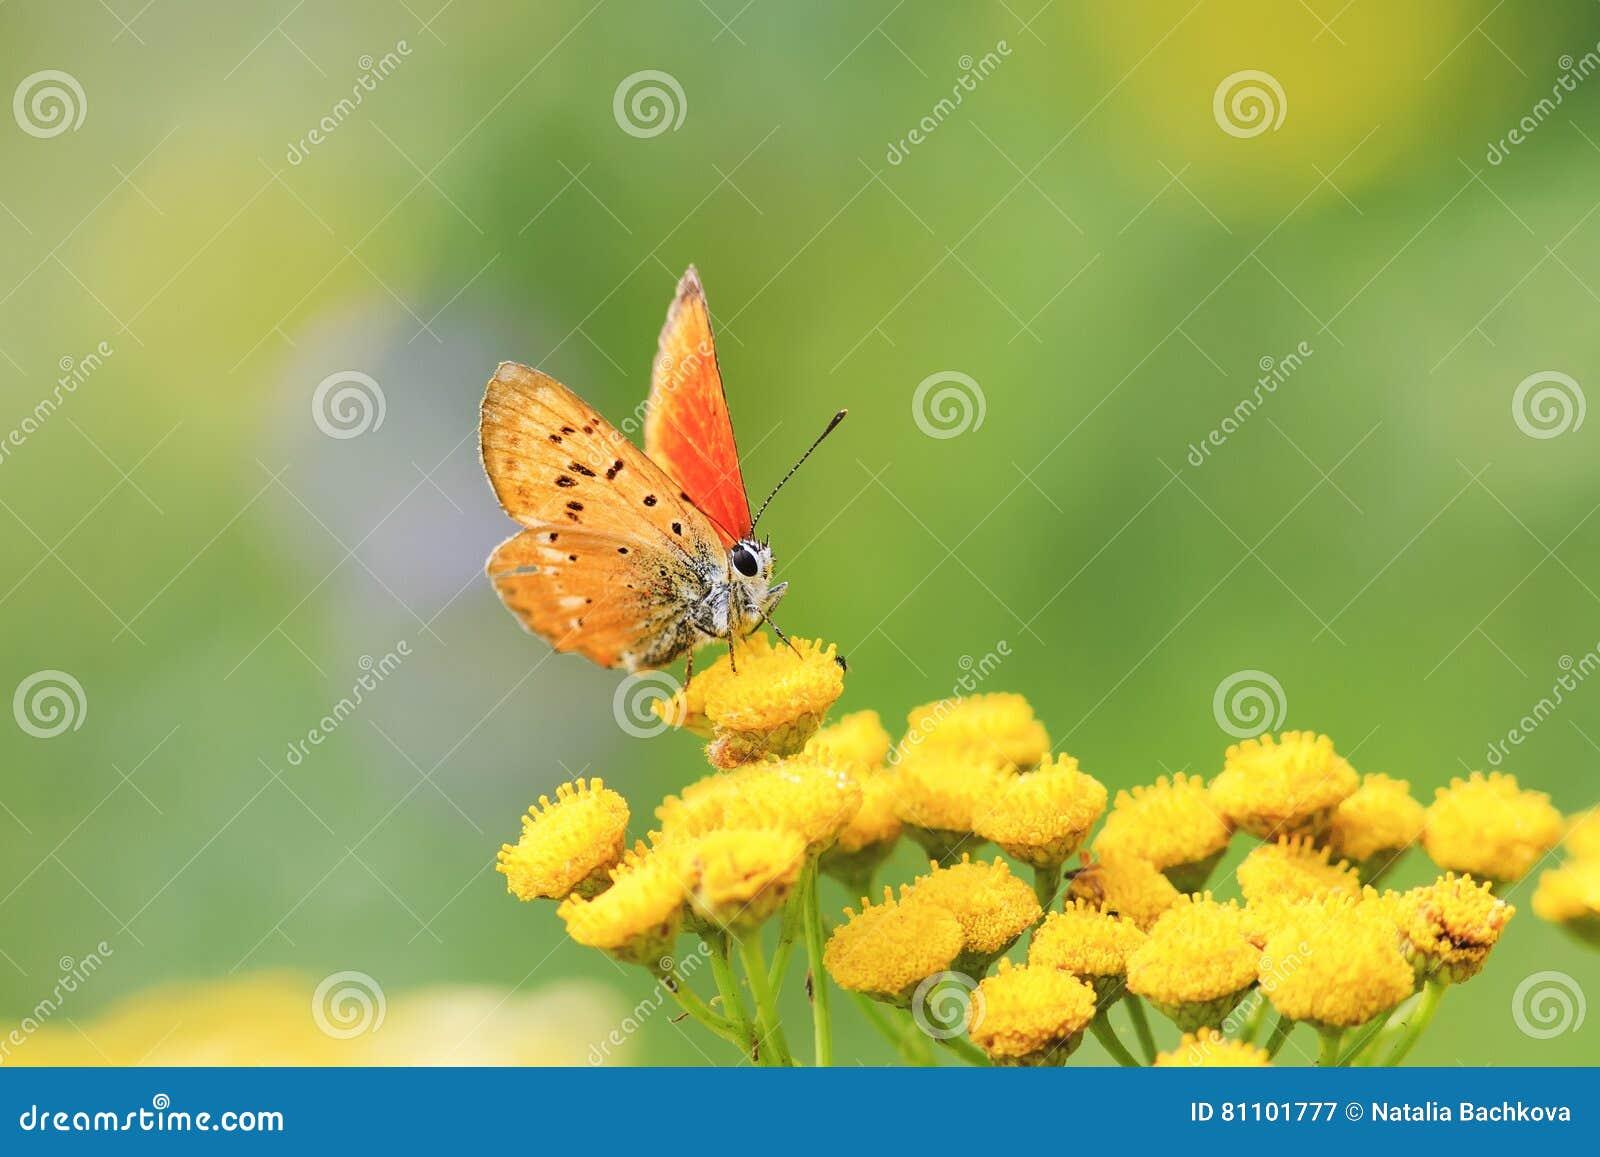 Orange butterfly sitting on yellow flowers on a summer meadow